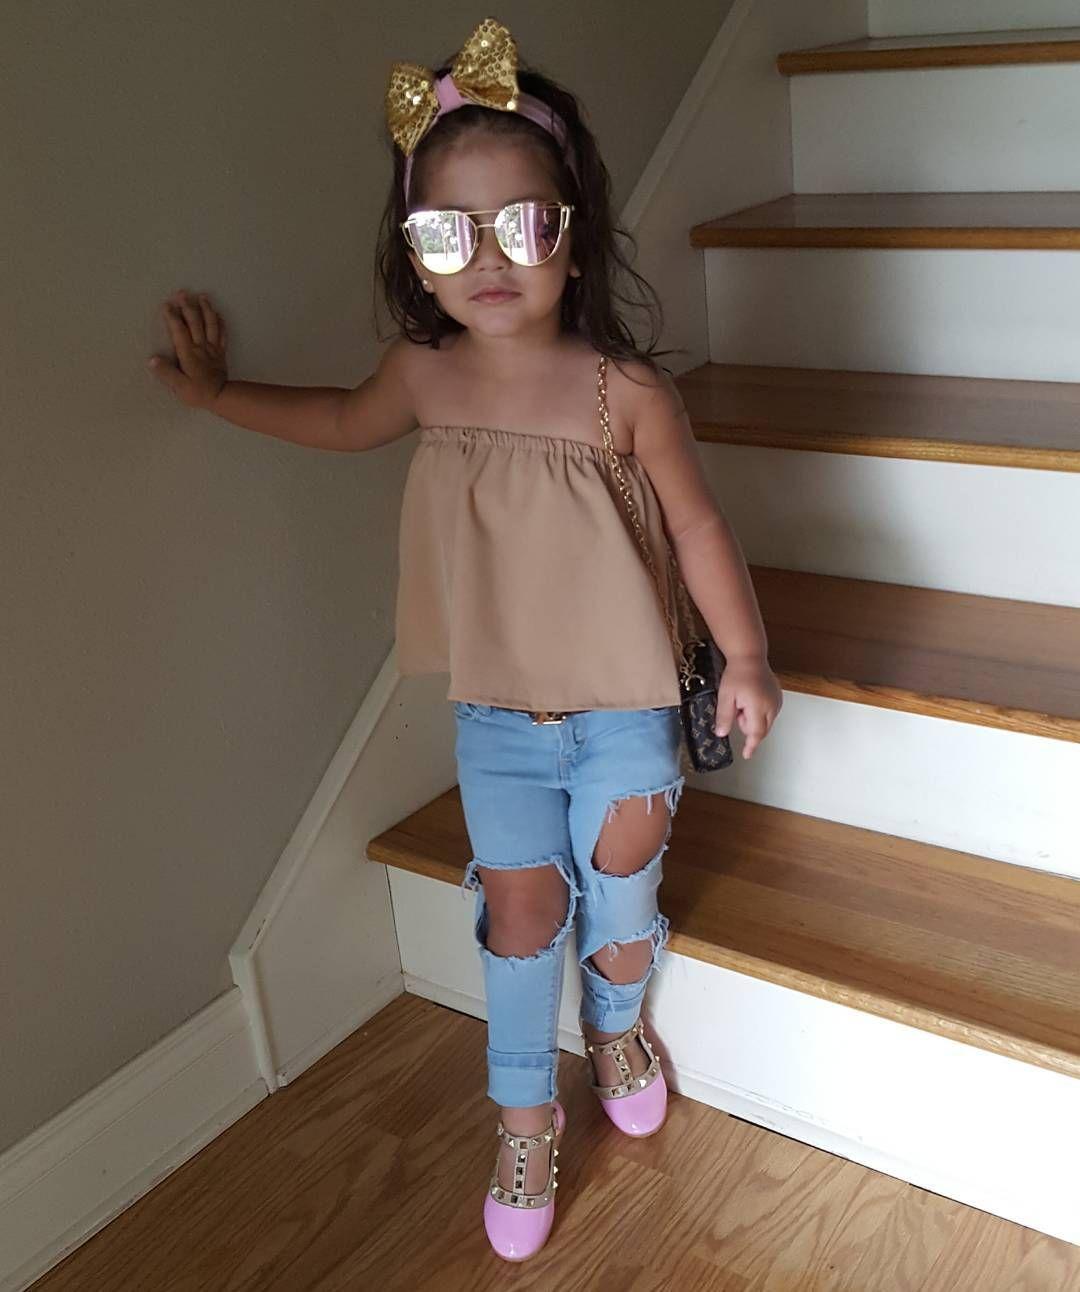 c15b3204cb2f0 Pin de Abi Quirino en Outfits para niños(a)